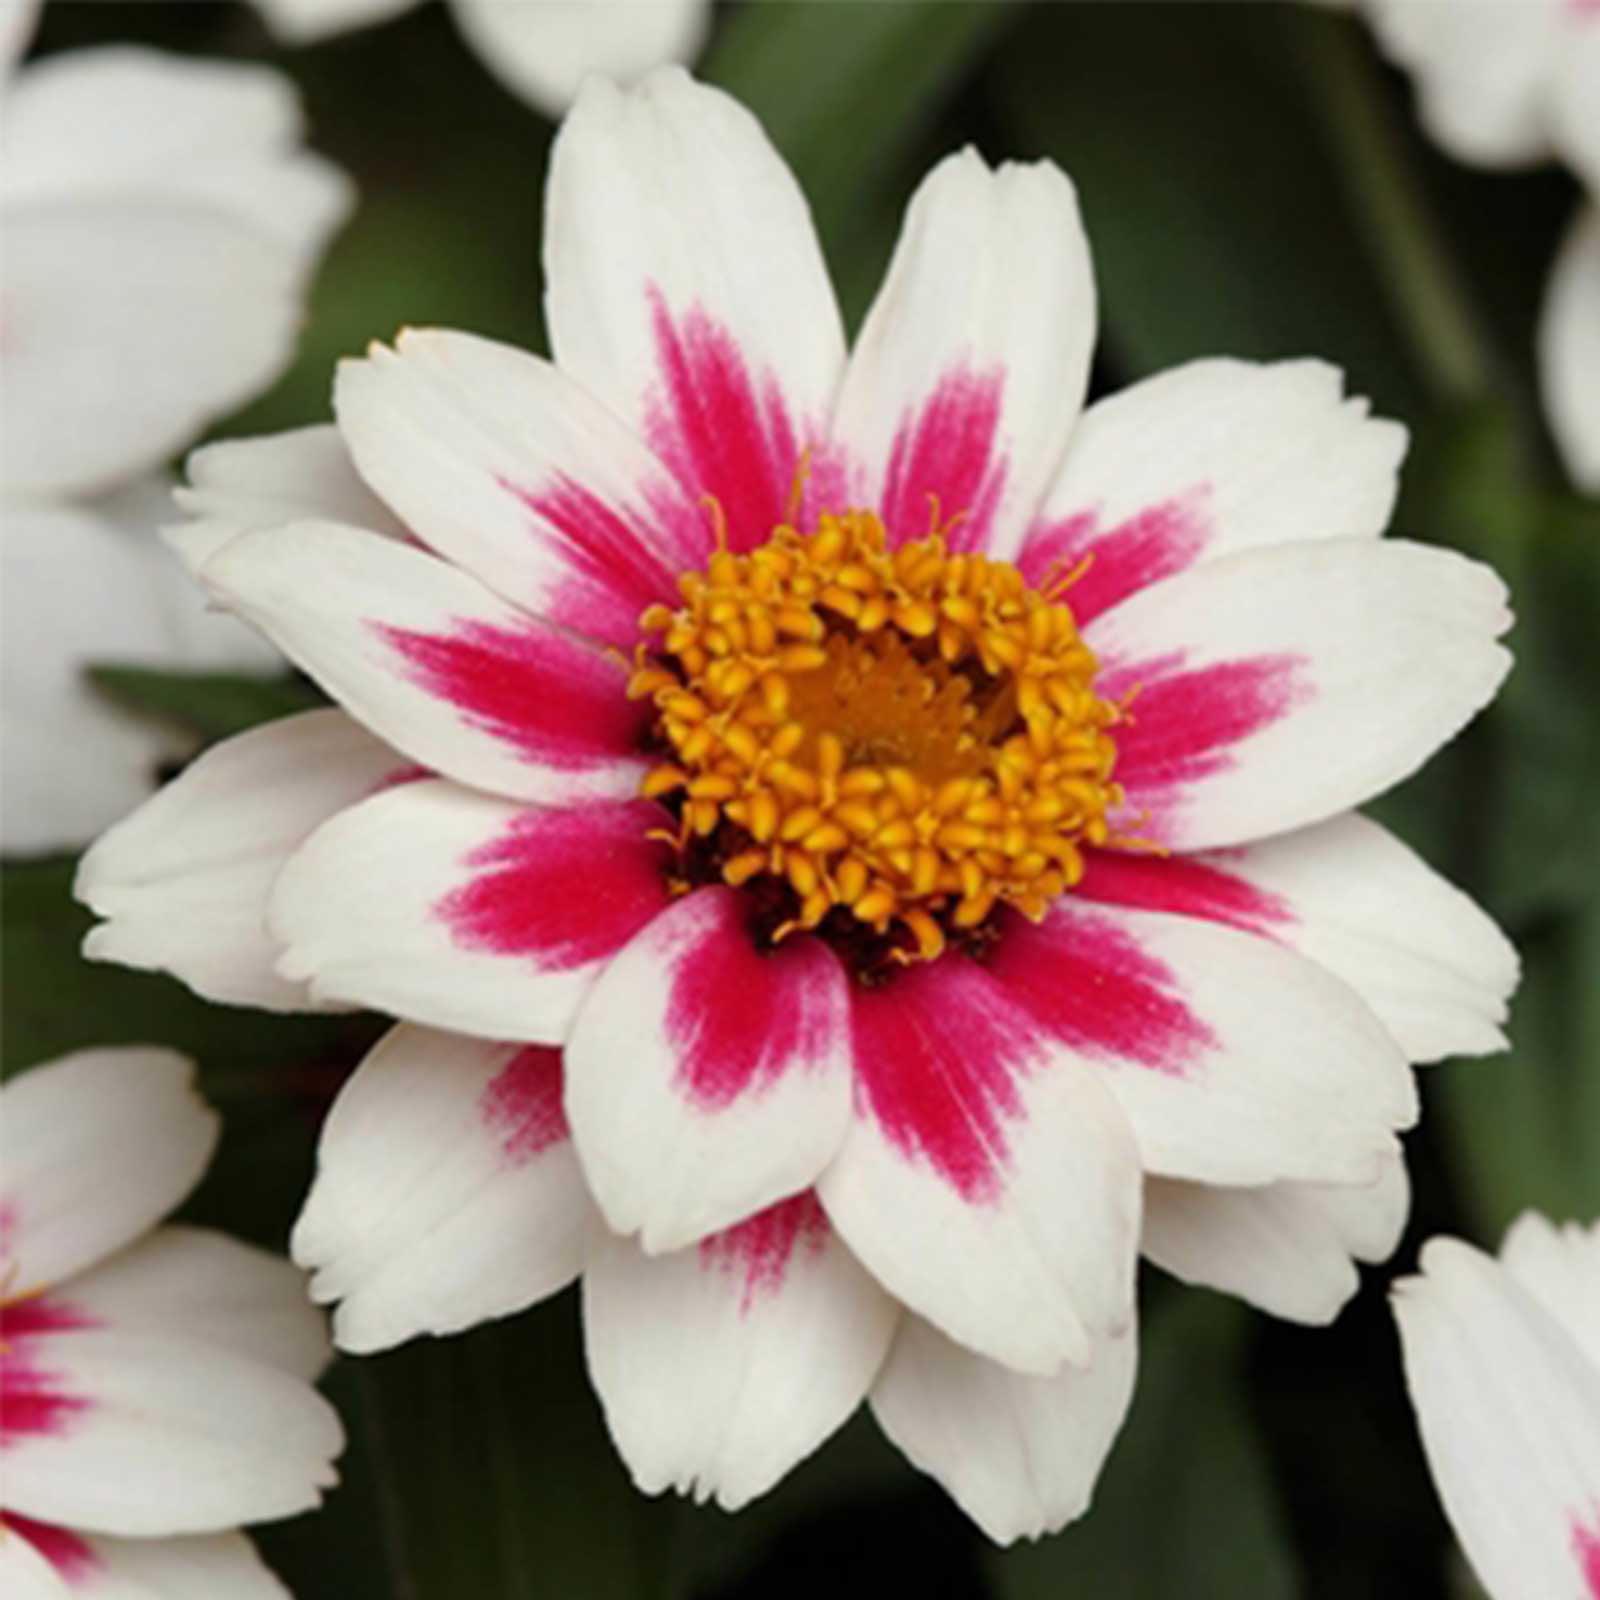 Zinnia Flower Garden Seeds - Zahara Series - Starlight Rose - 100 Seeds - Annual Flower Gardening Seed - Zinnia Marylandia